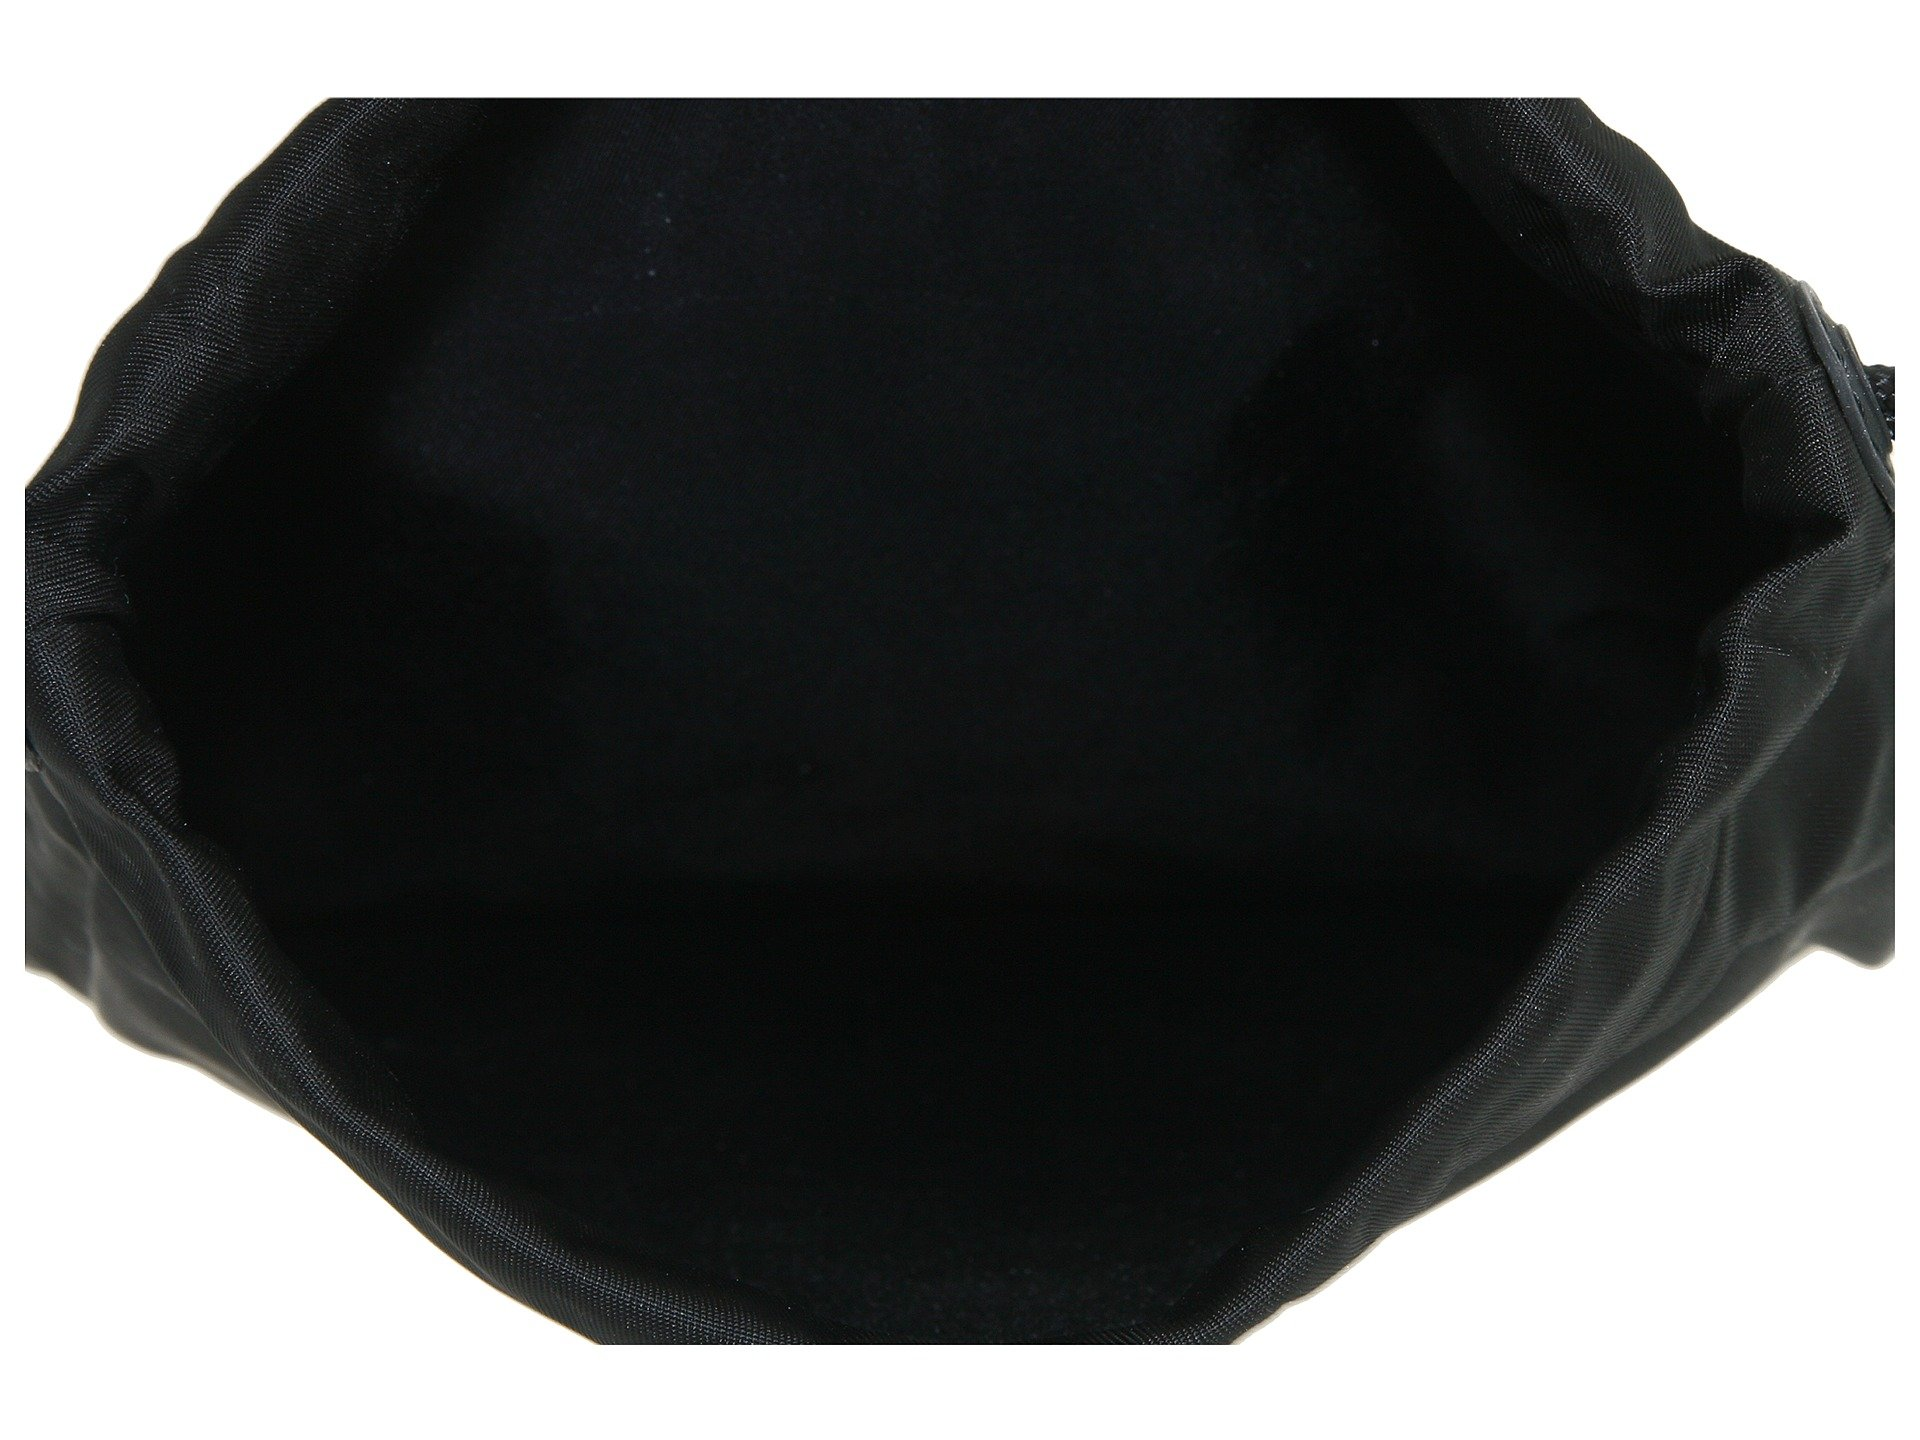 Accessories Shoe pair Tumi Packing Black Bags 4Hwxn7qaF